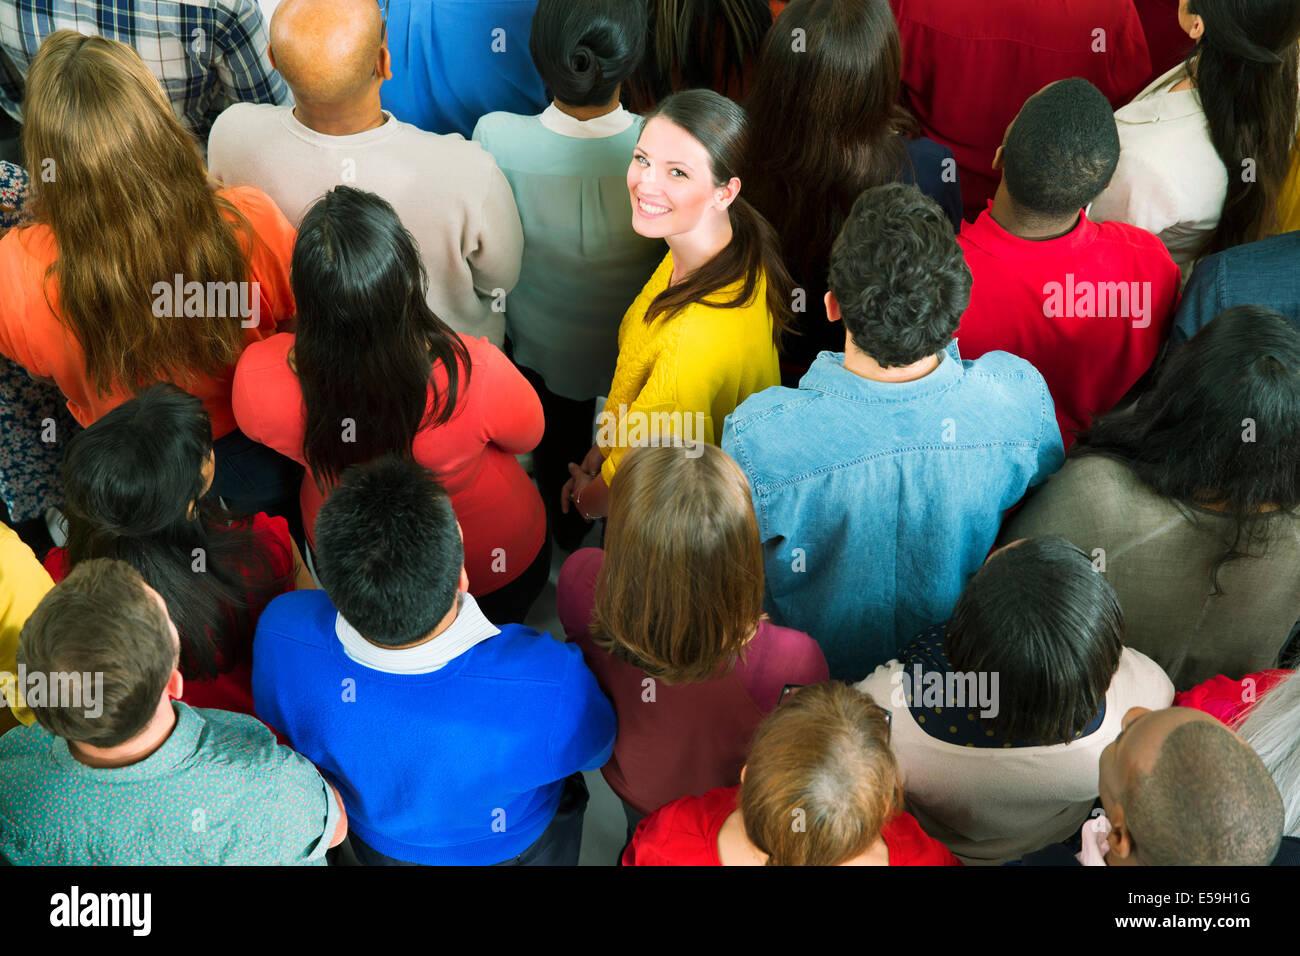 Portrait of confident businesswoman in crowd - Stock Image